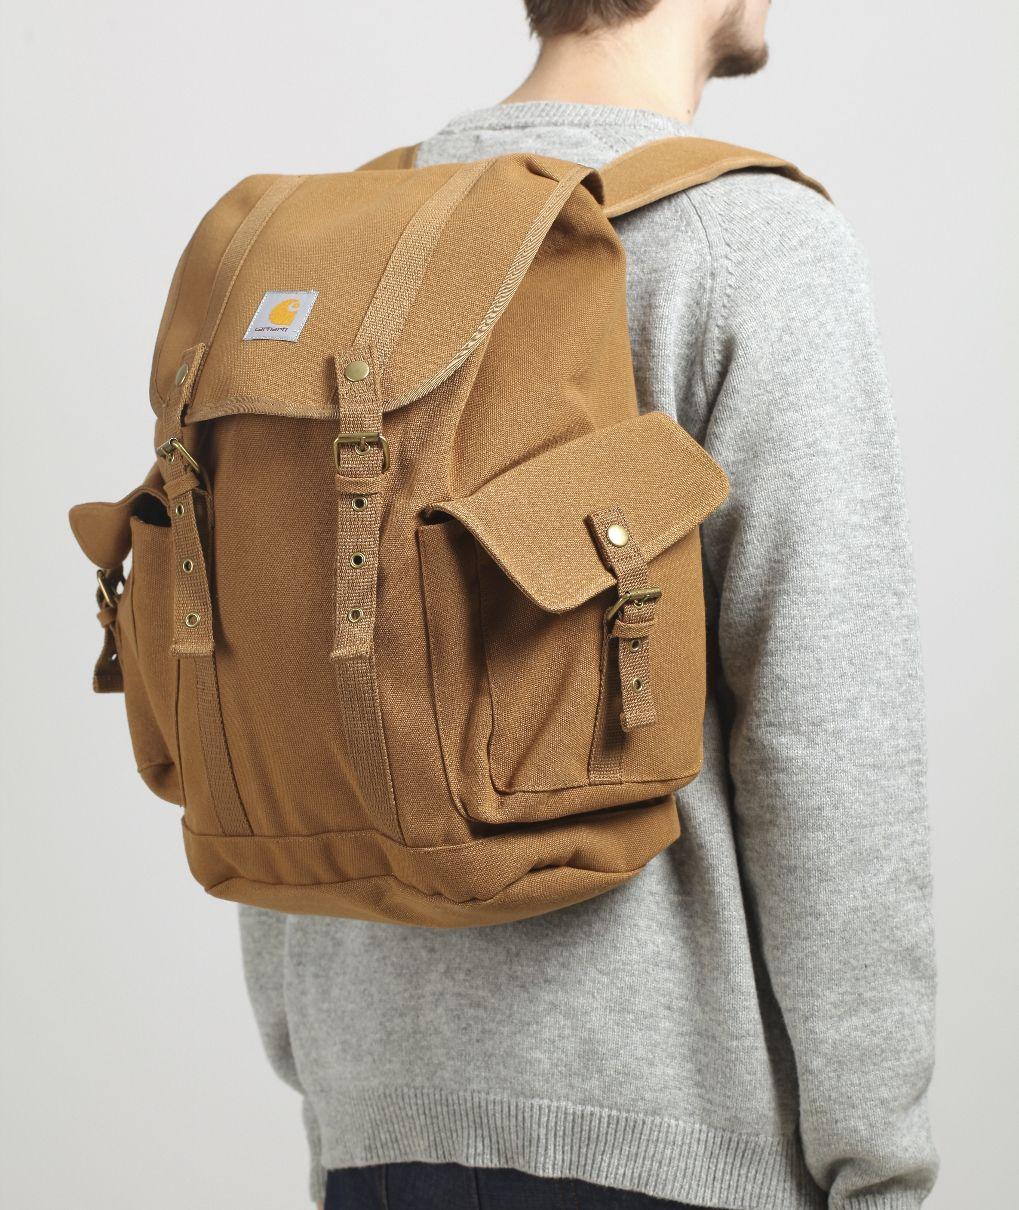 Carhartt Tramp Backpack